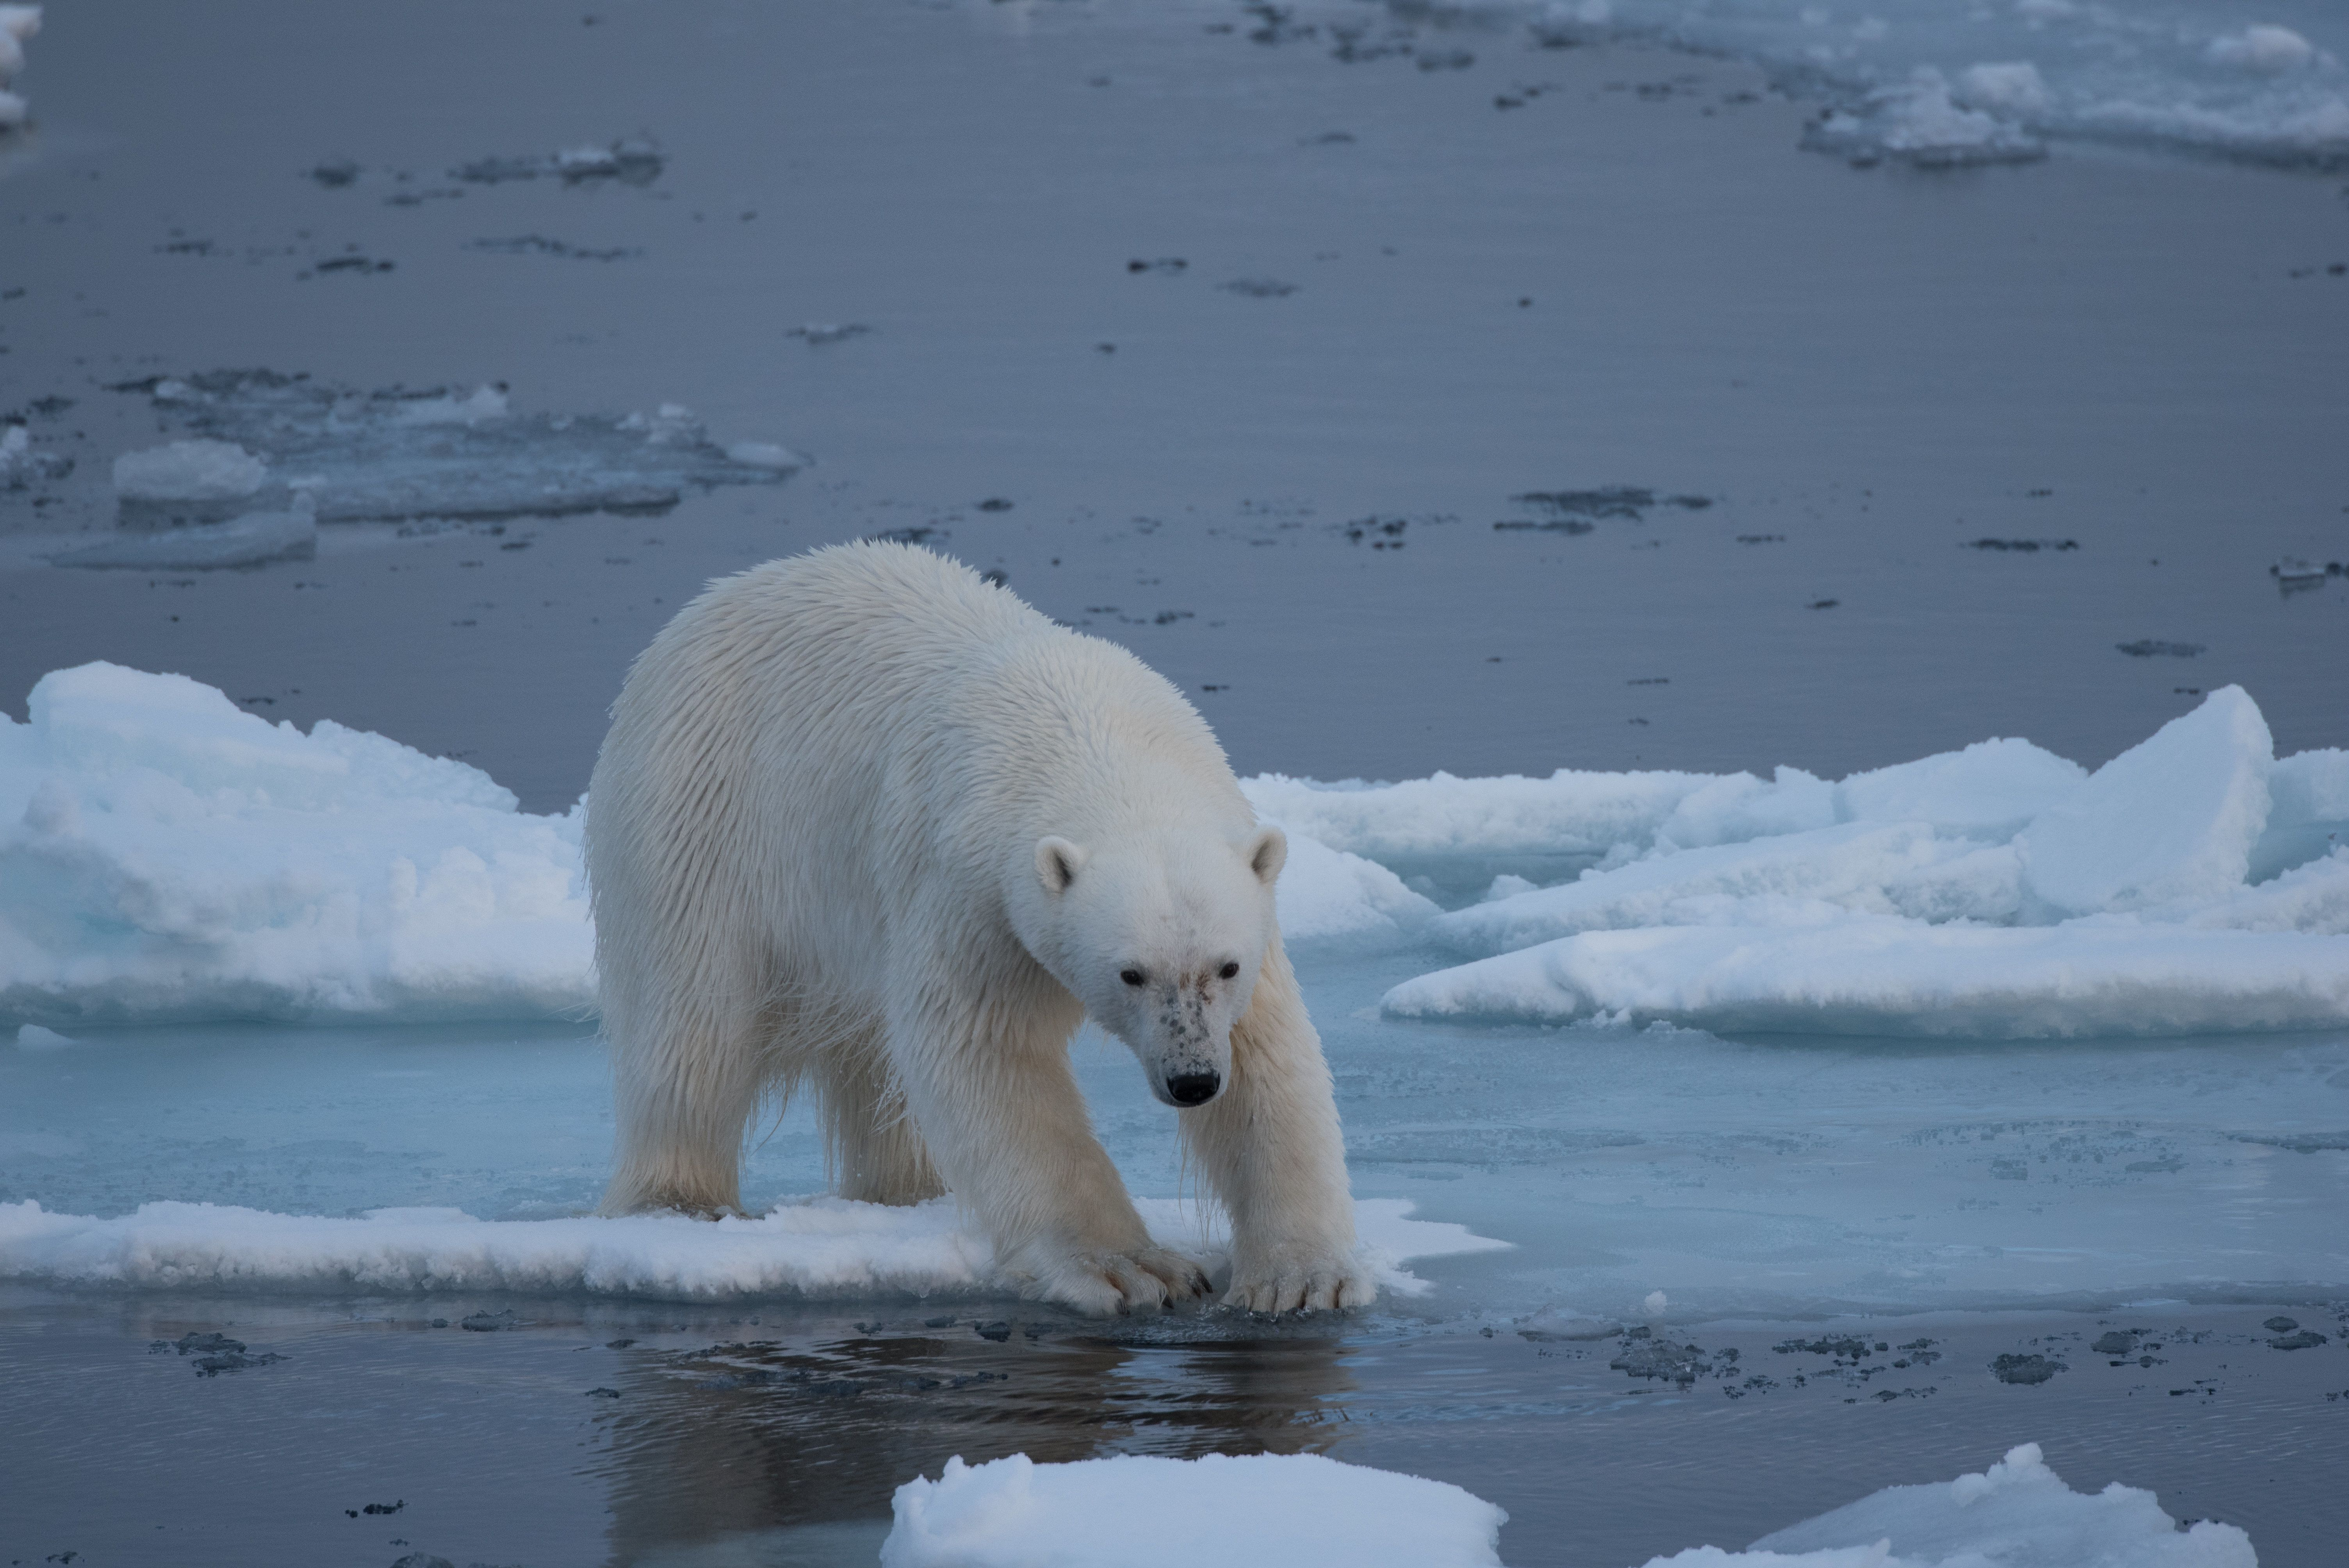 A polar bear tentatively steps from snow covered ice onto thin sea ice